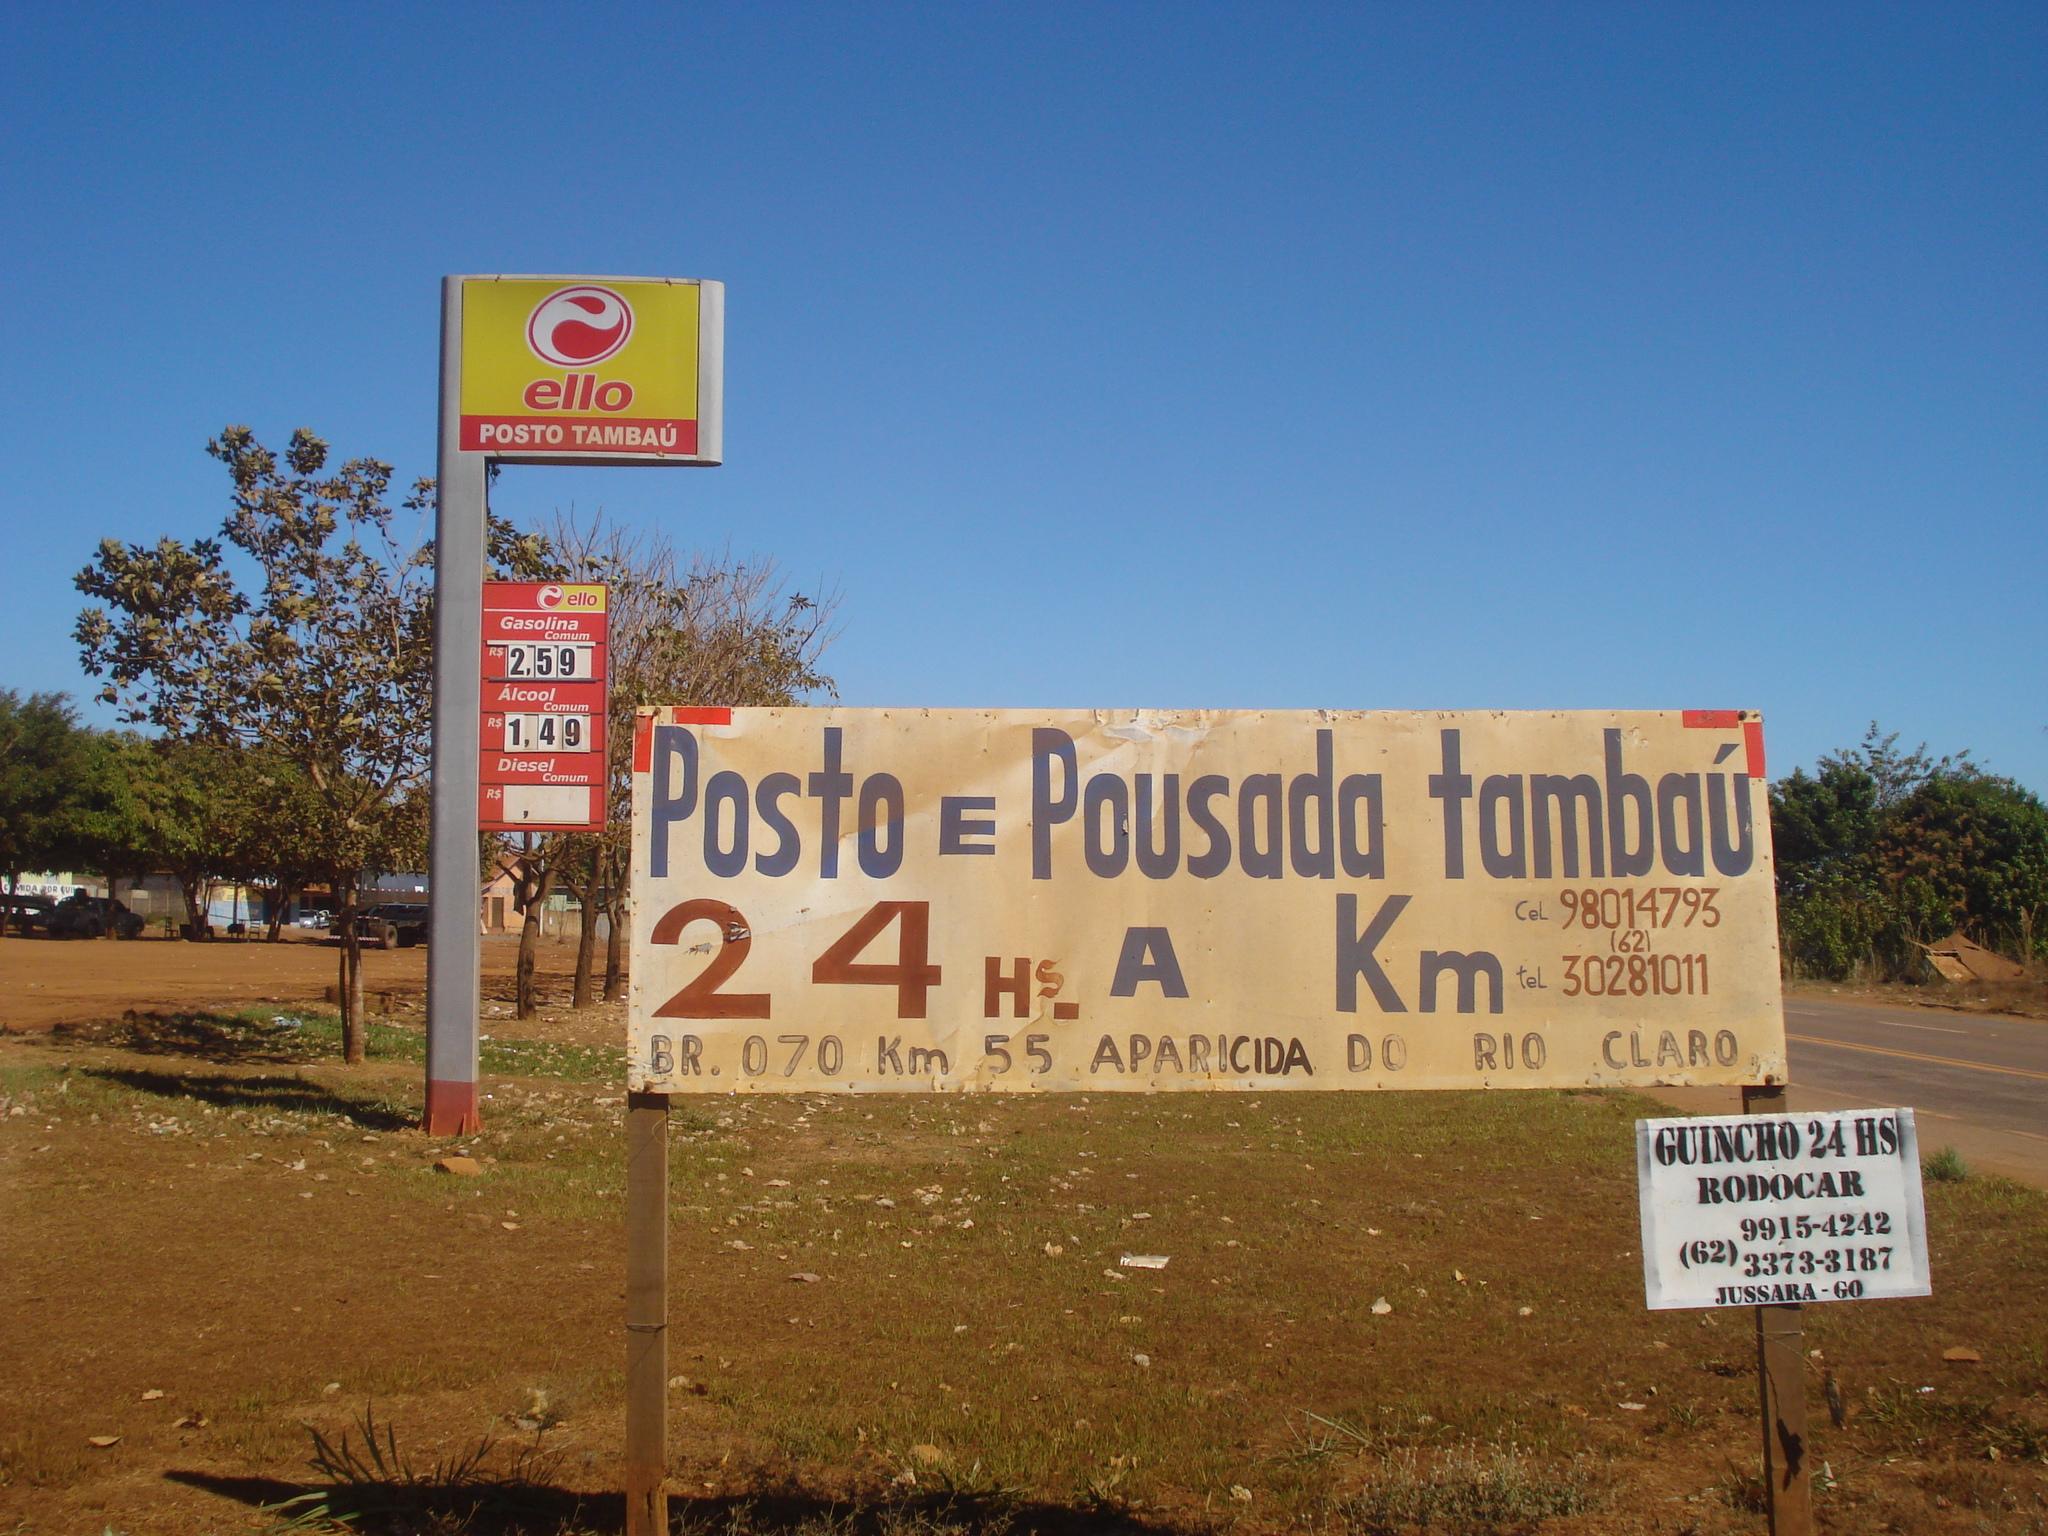 Montes Claros de Goiás Goiás fonte: upload.wikimedia.org